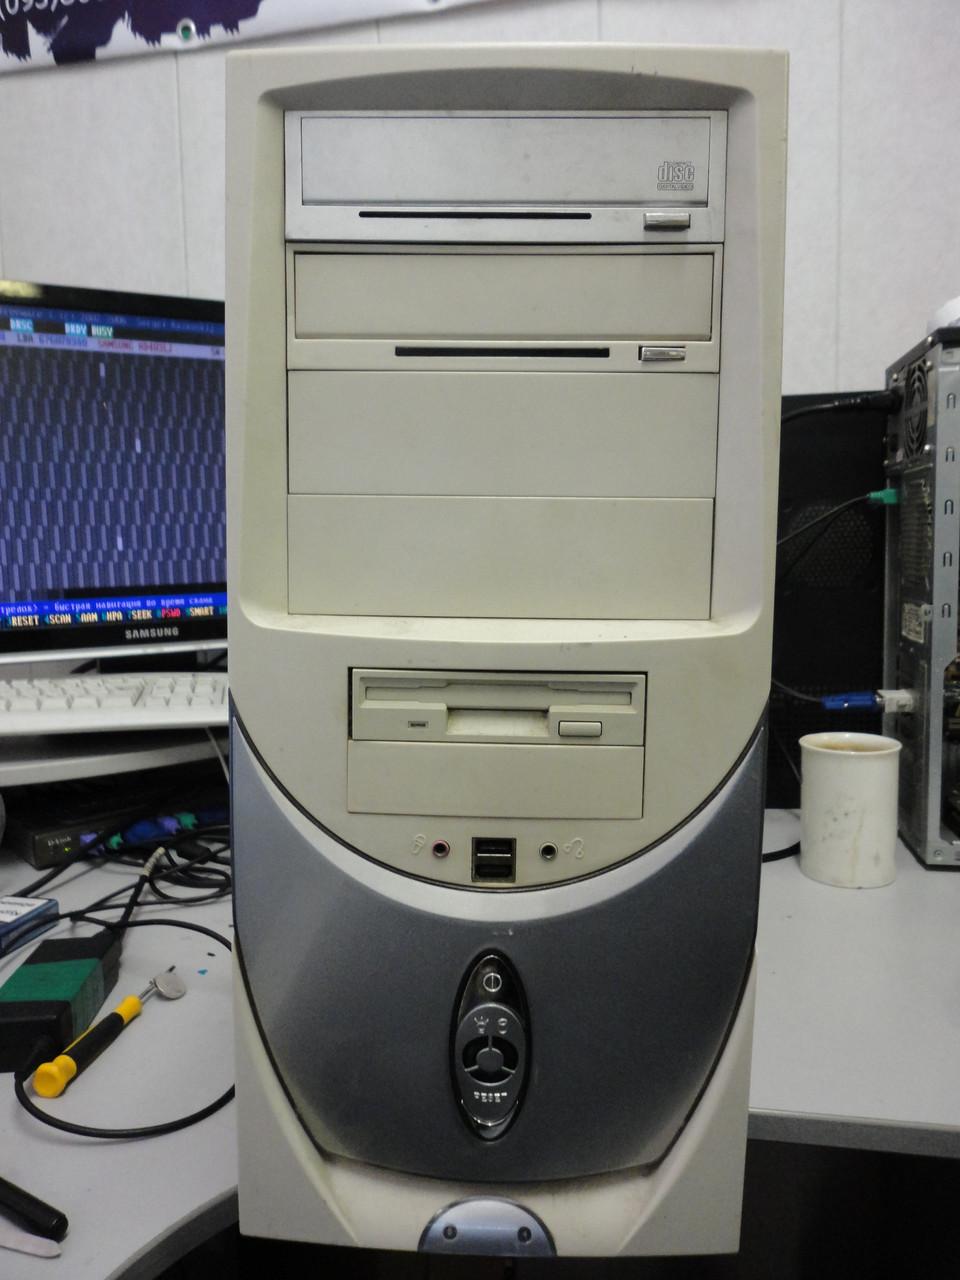 Настольный компьютер Biostar NF325-A7/AMD Sempron, 1,6 GHz/60Gb/256Mb/